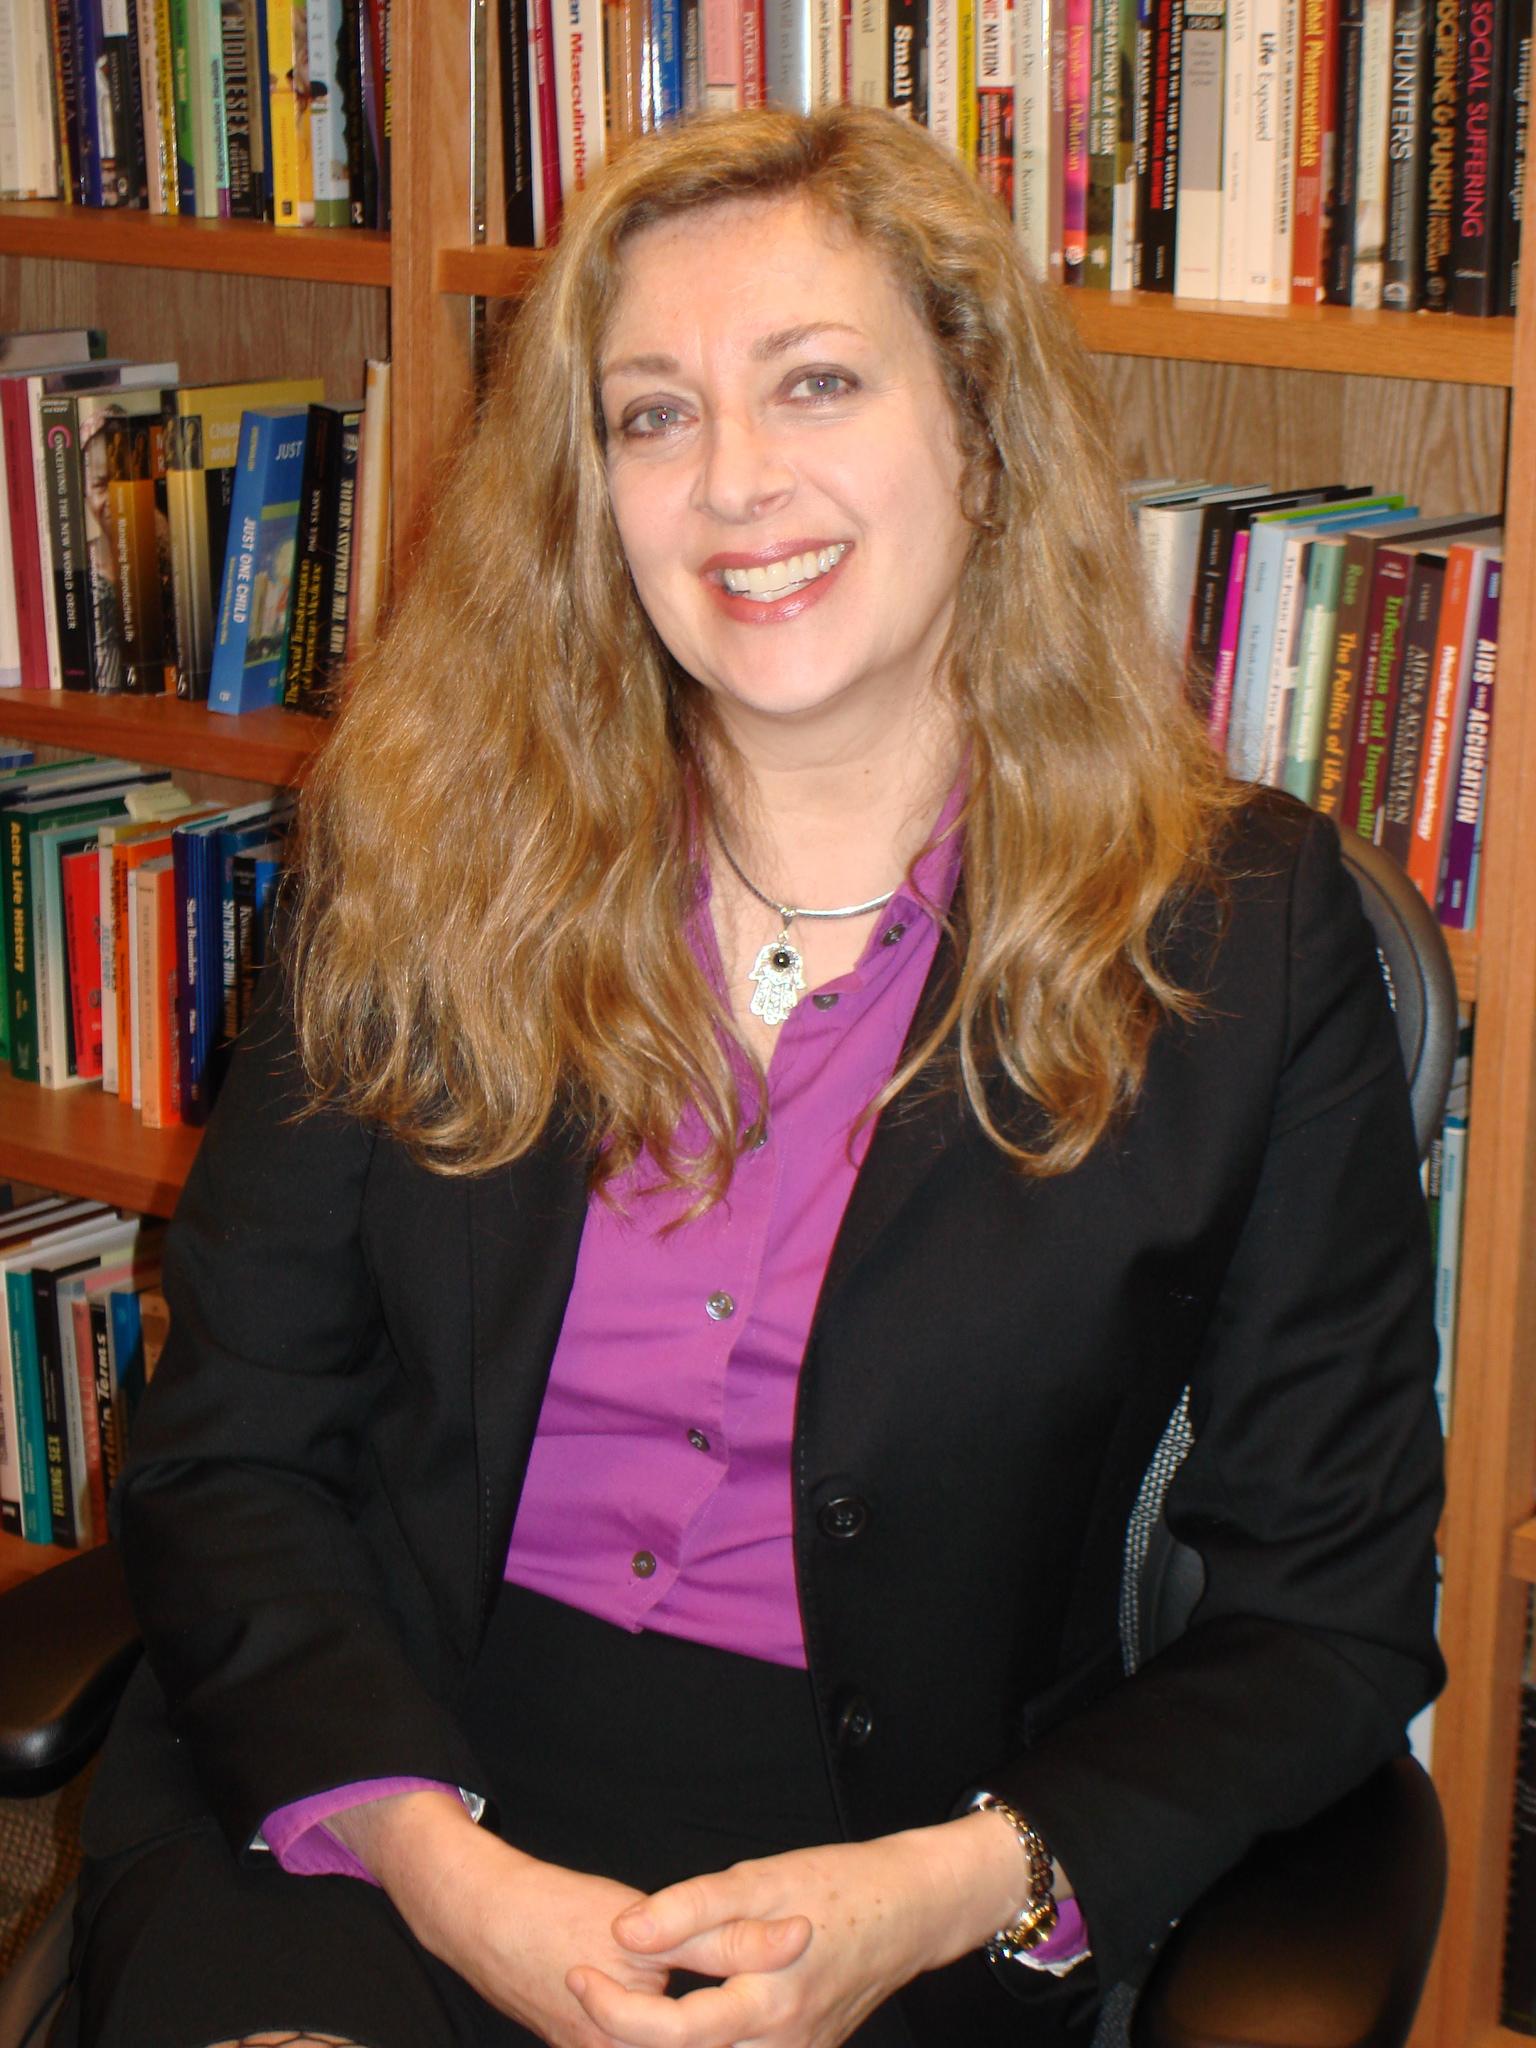 Marcia C. Inhorn at Yale, 2009.